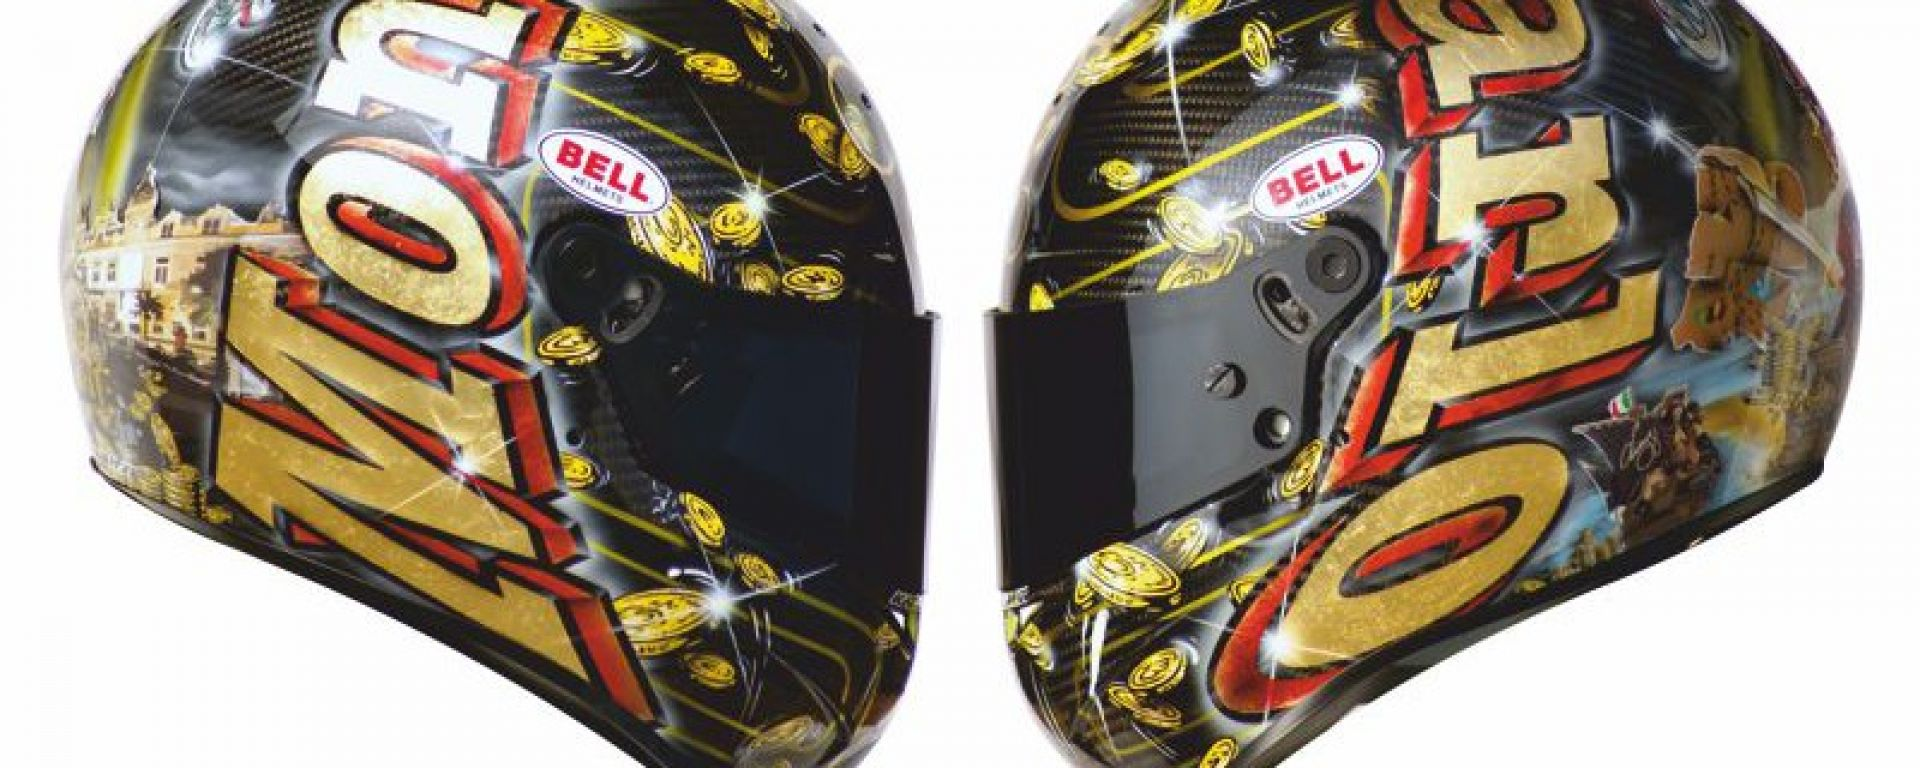 Kaos Design: un casco speciale per Liuzzi